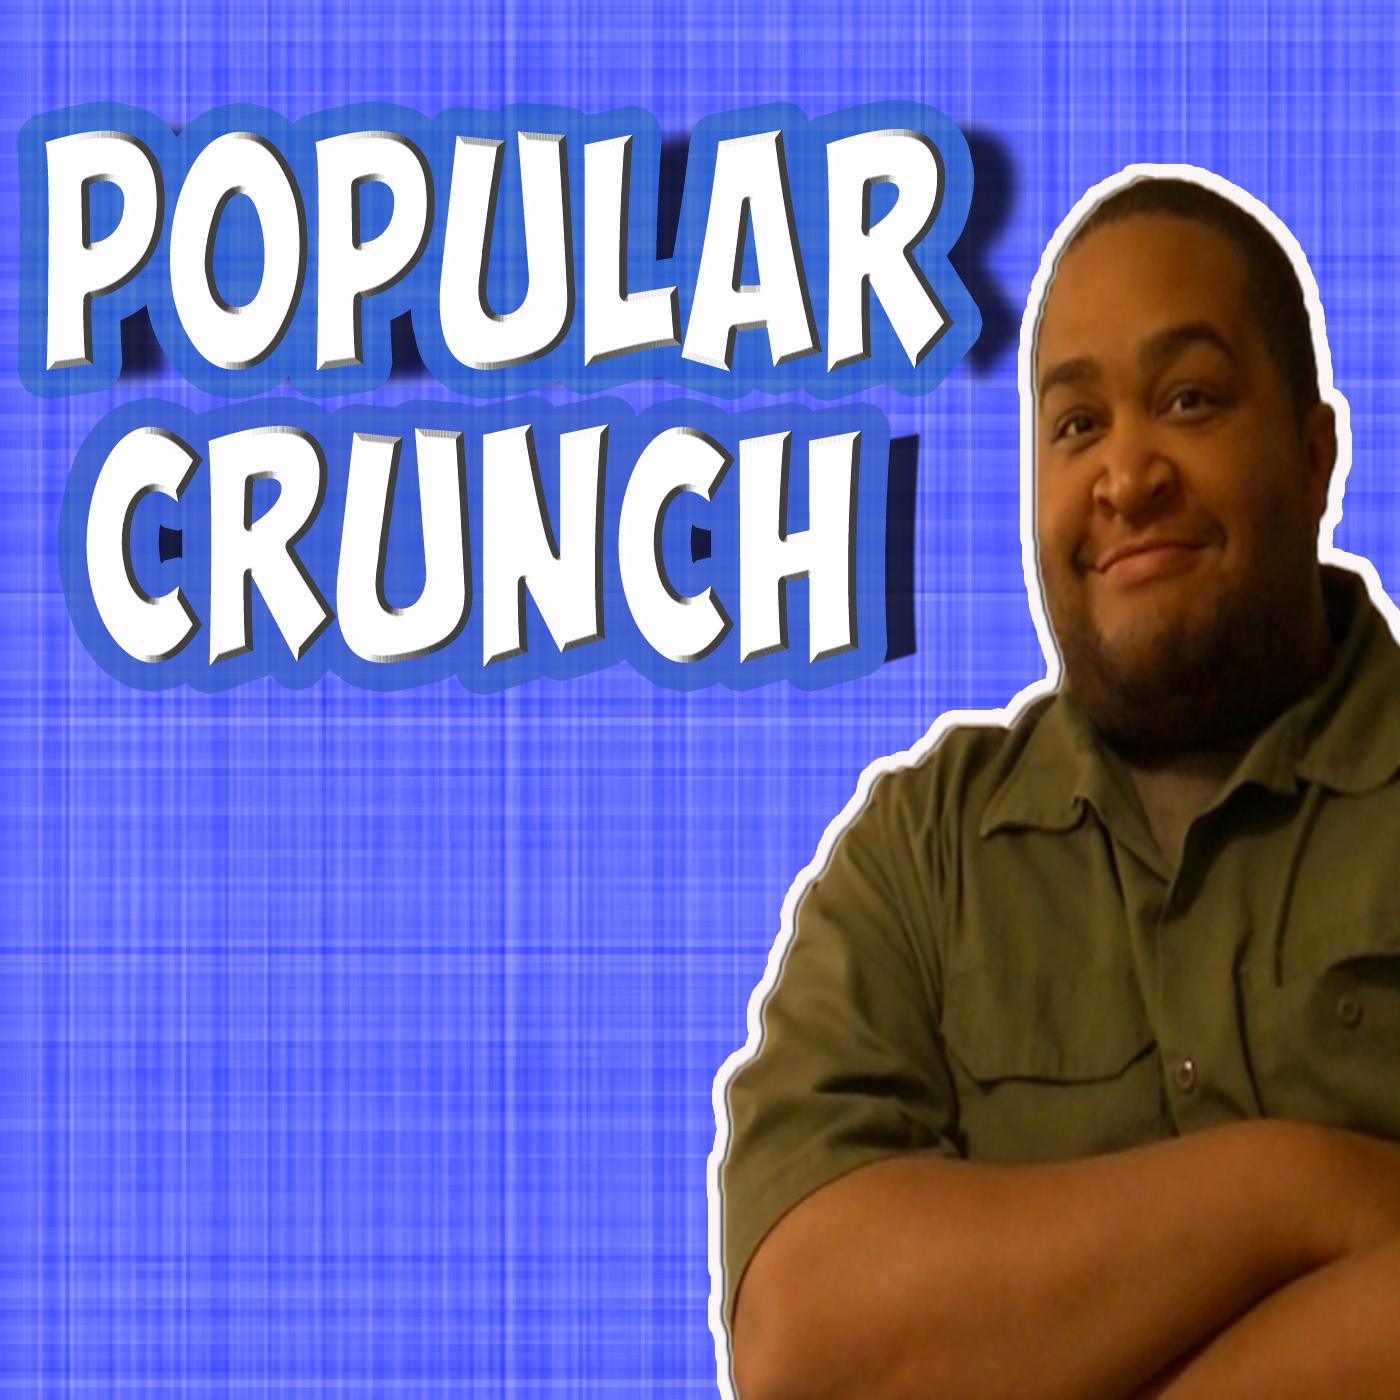 Popular Crunch